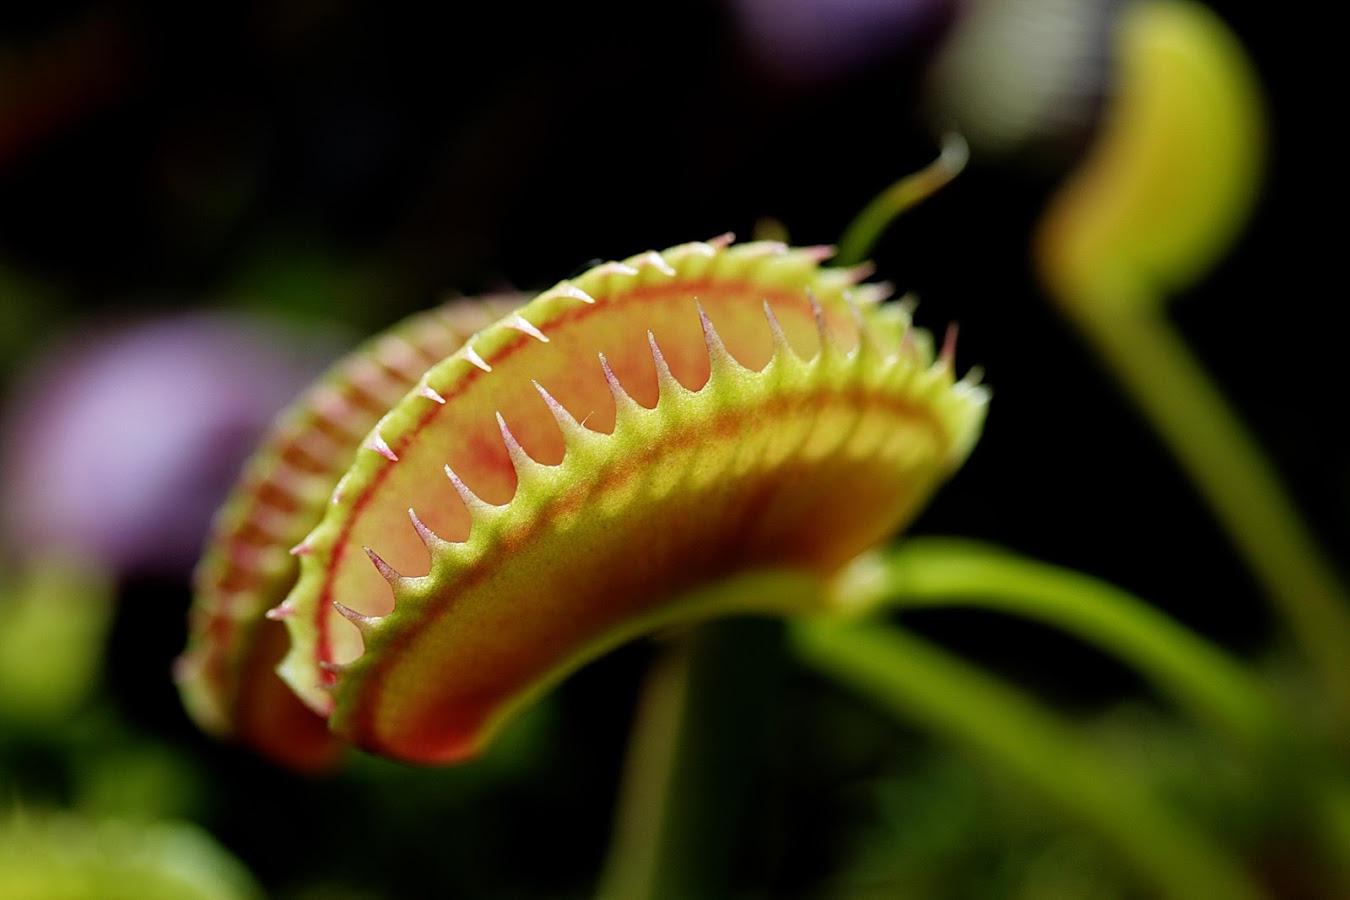 Venus flytrap Wallpapers and Background Images   stmednet 1350x900